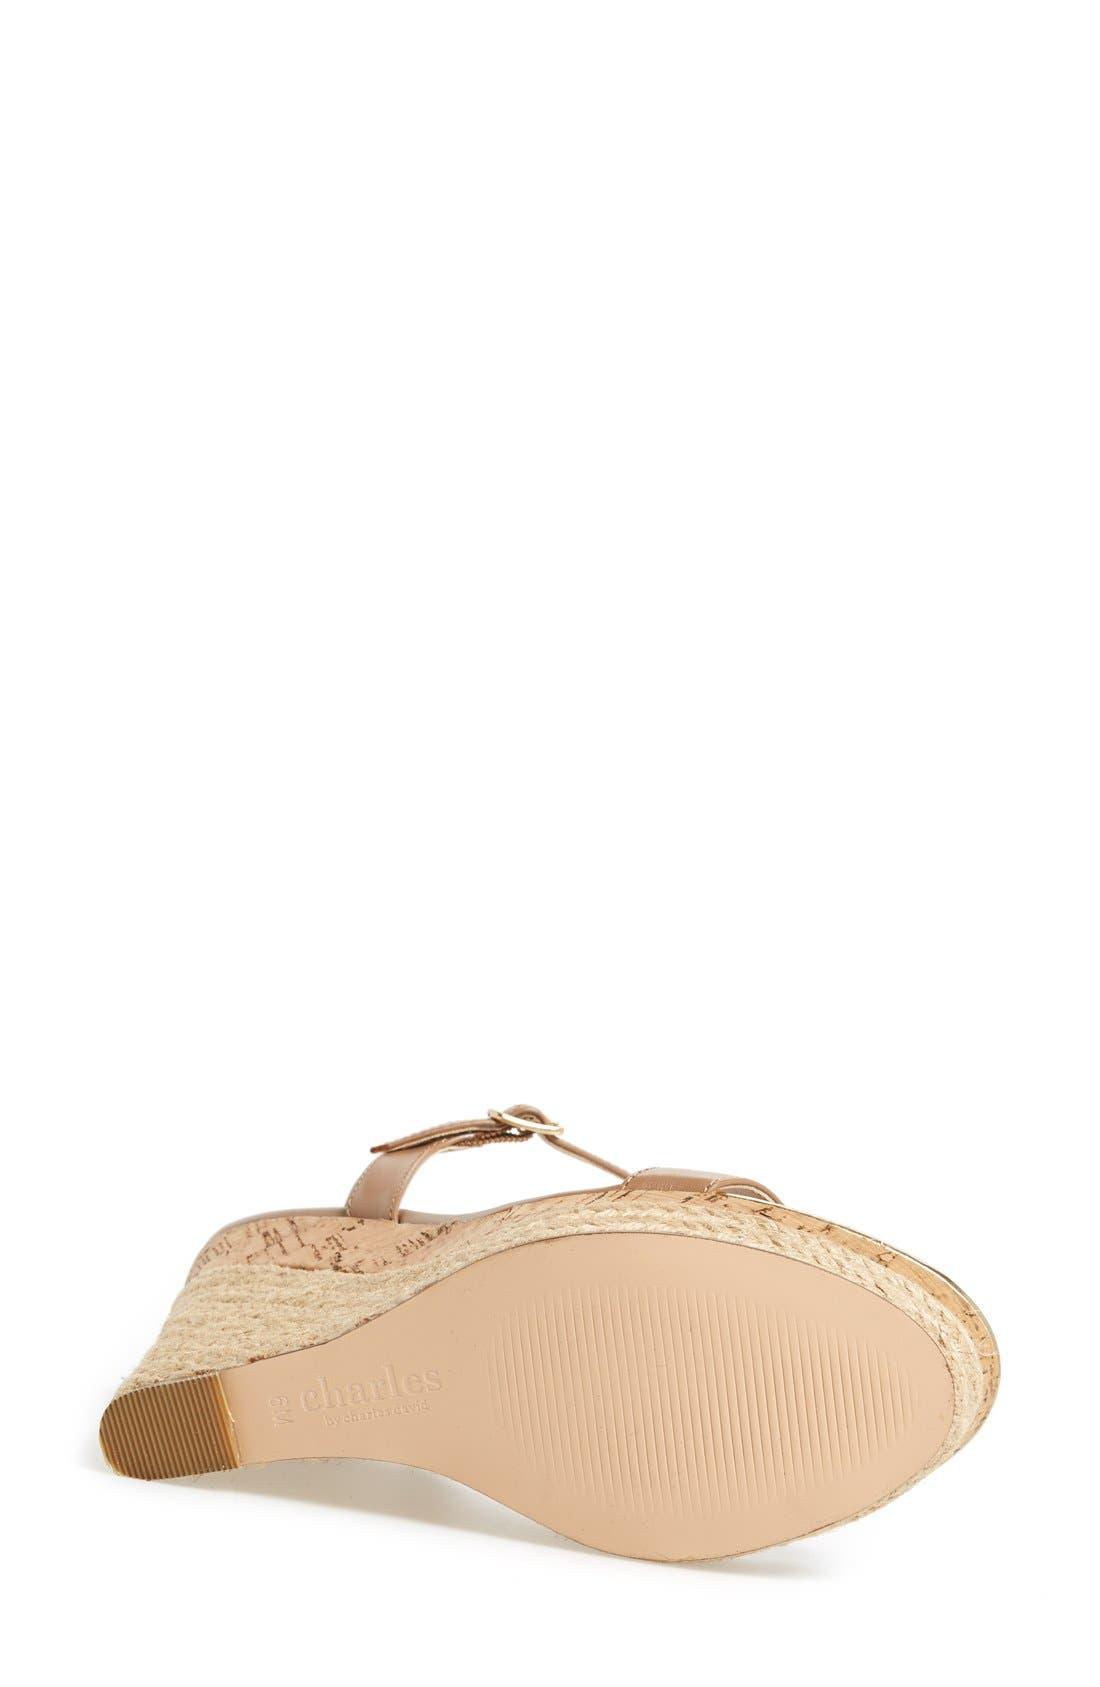 ,                             'Alabama' Espadrille Wedge Sandal,                             Alternate thumbnail 12, color,                             250